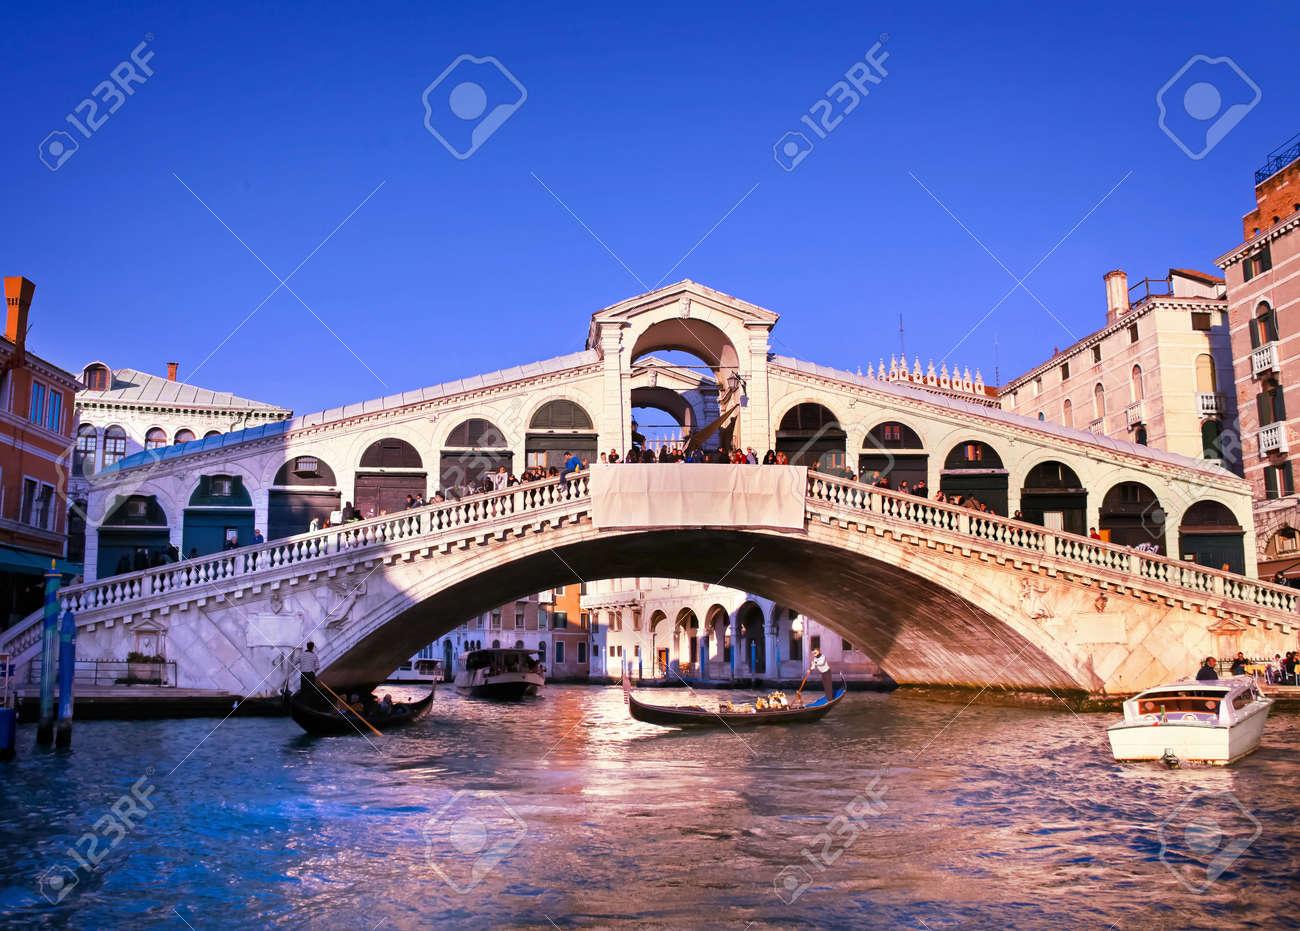 Colorful Rialto Bridge at Grand Canal, Venice, Italy. Stock Photo - 12903794